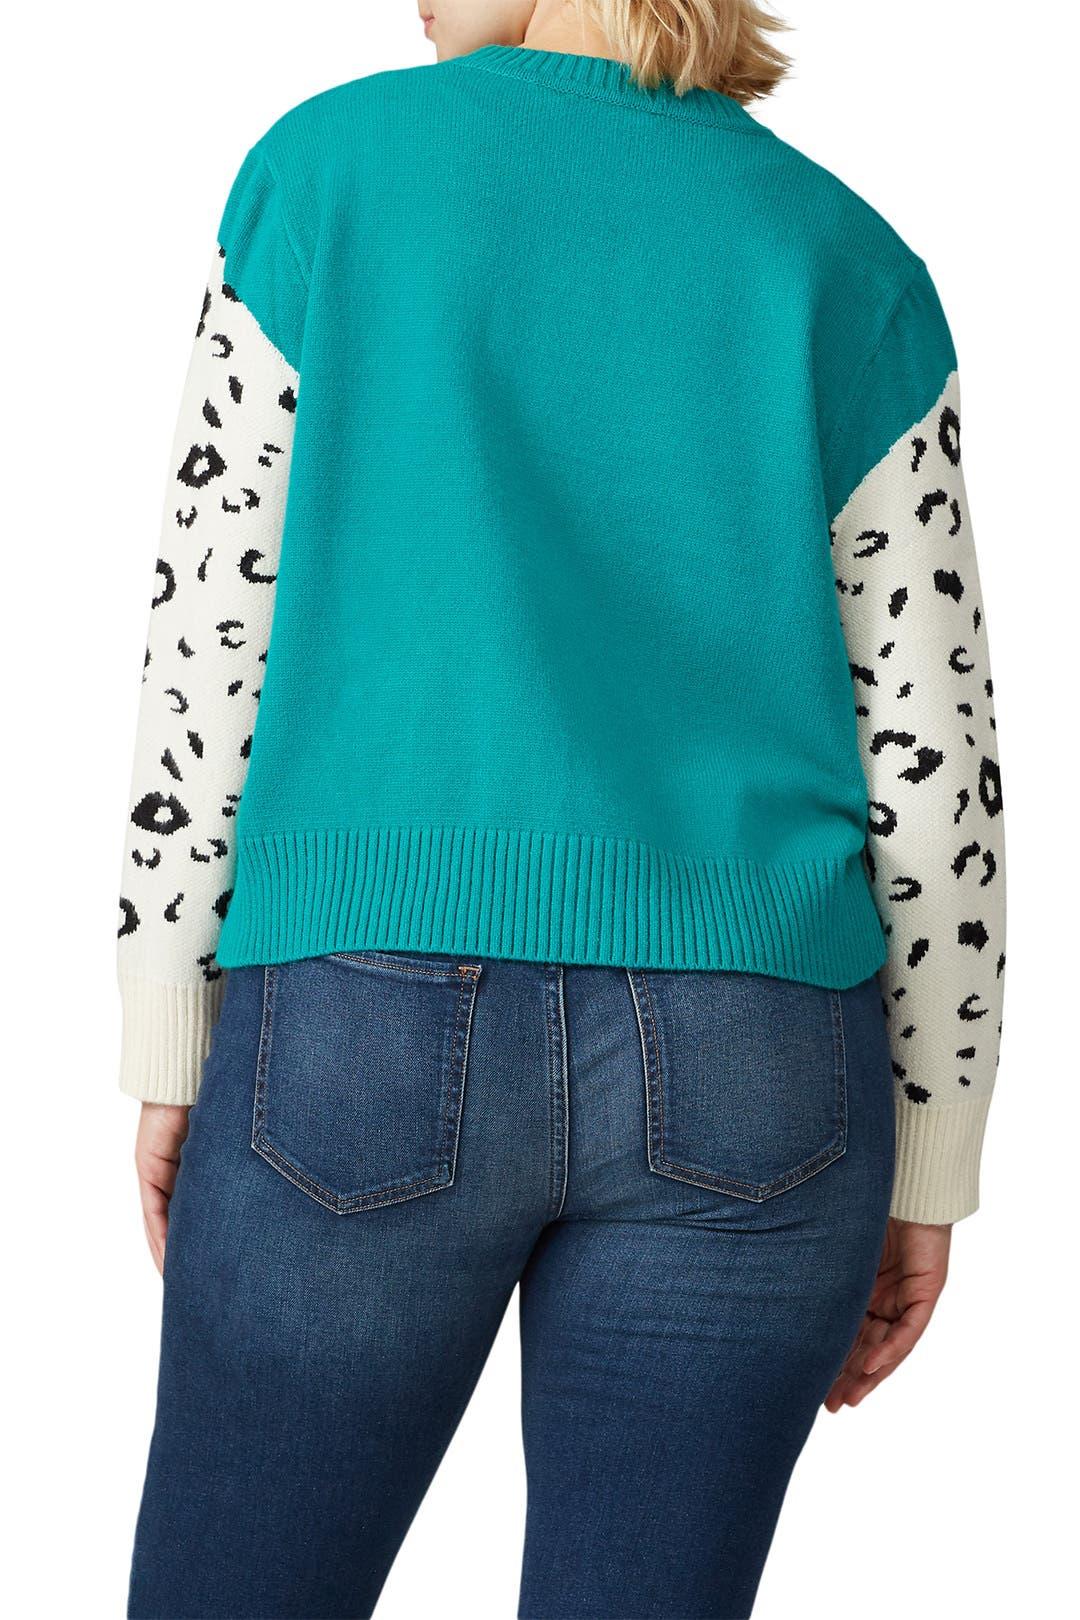 MINKPINK Snow Leopard Knit Sweater